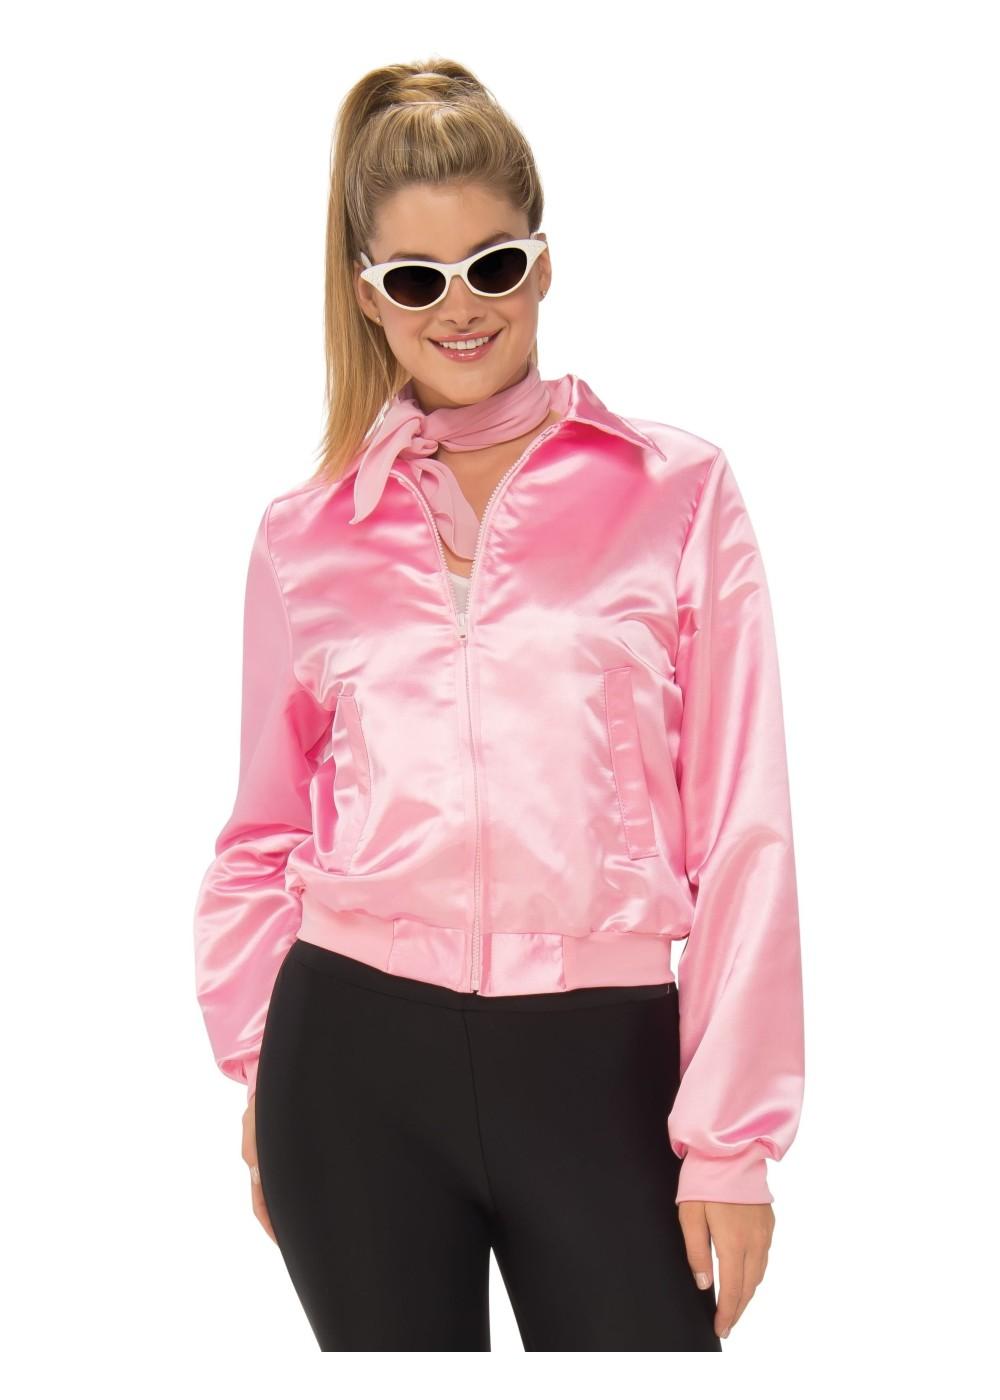 Pink Ladies Jacket Costume 1950s Costumes